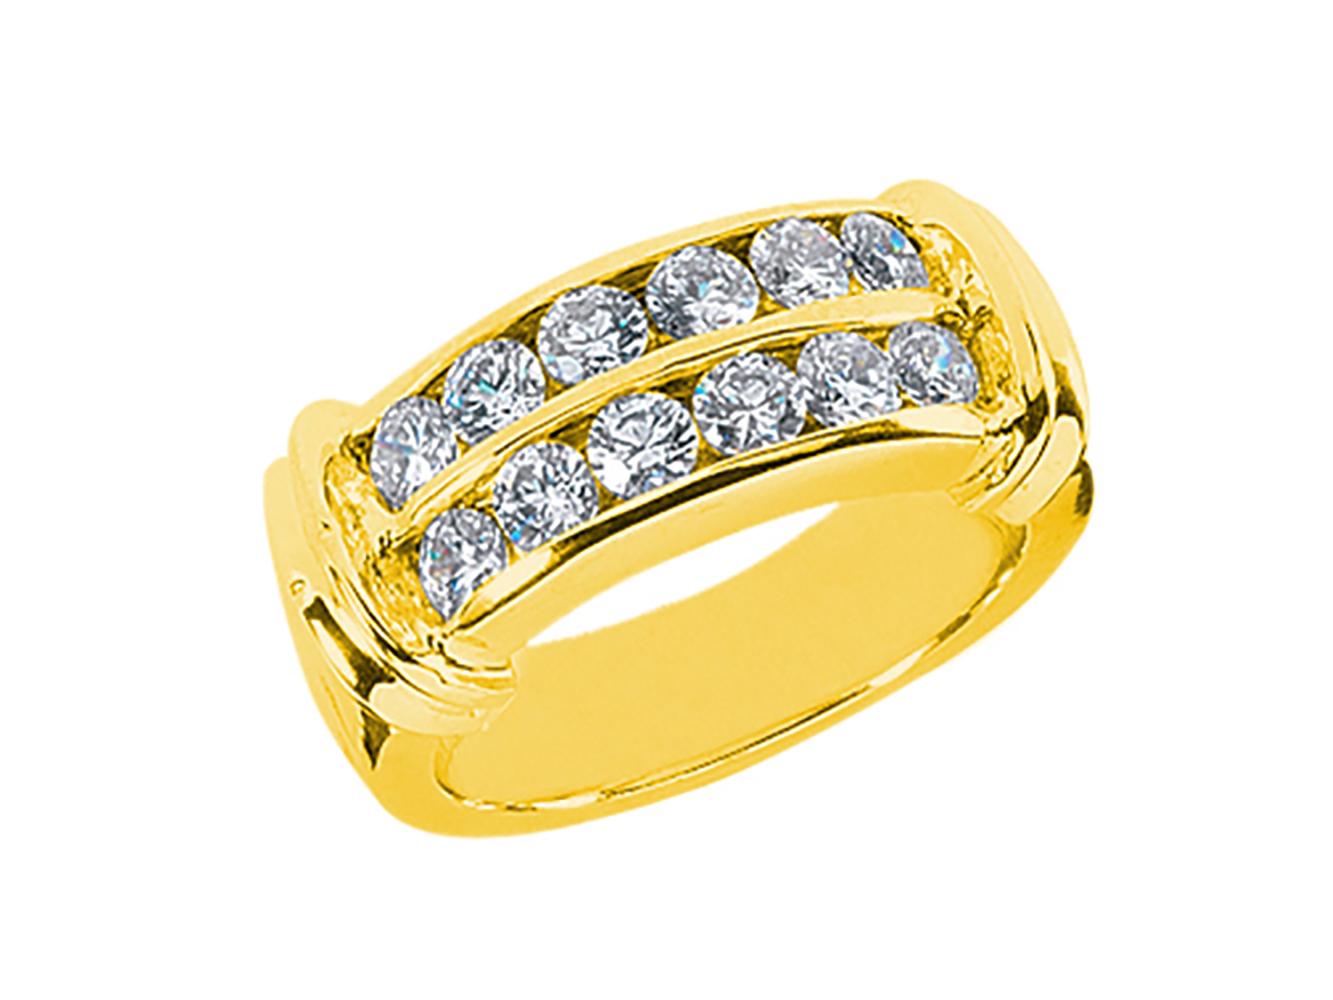 1 20ct Diamond 2row Wedding Band Ring 10k Yellow Gold